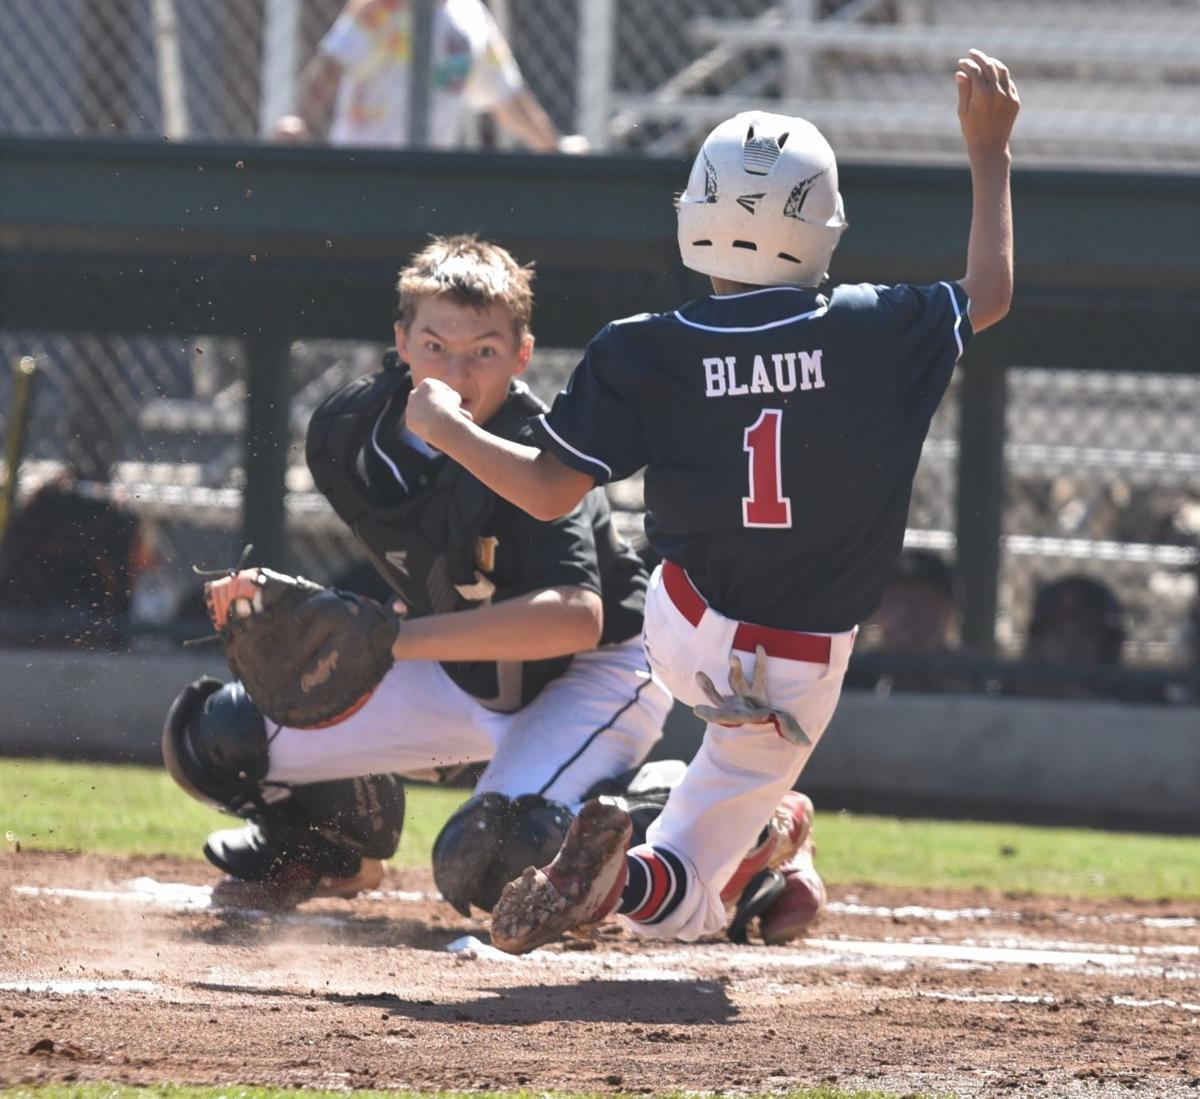 St. Helena Little League Junior All-Stars second baseman Charlie Blaum